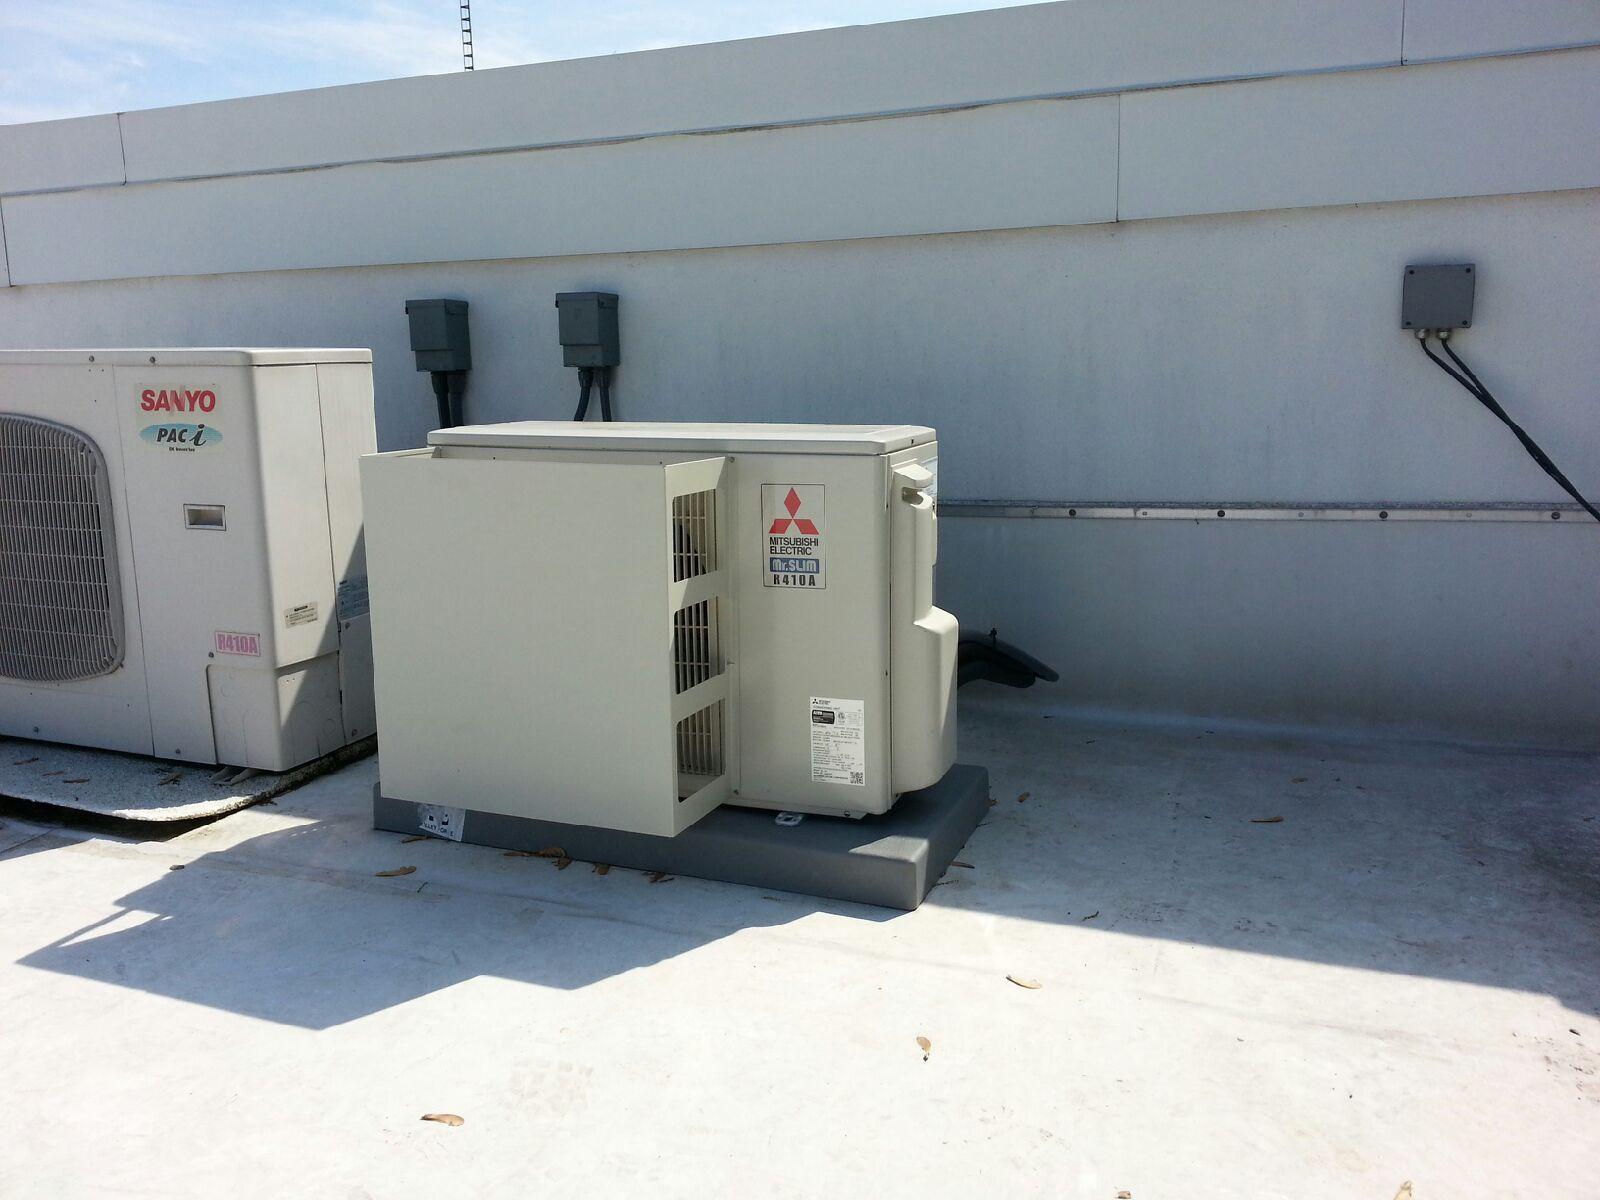 Mitsubishi Minisplit Ac Outdoor Unit For Server Room